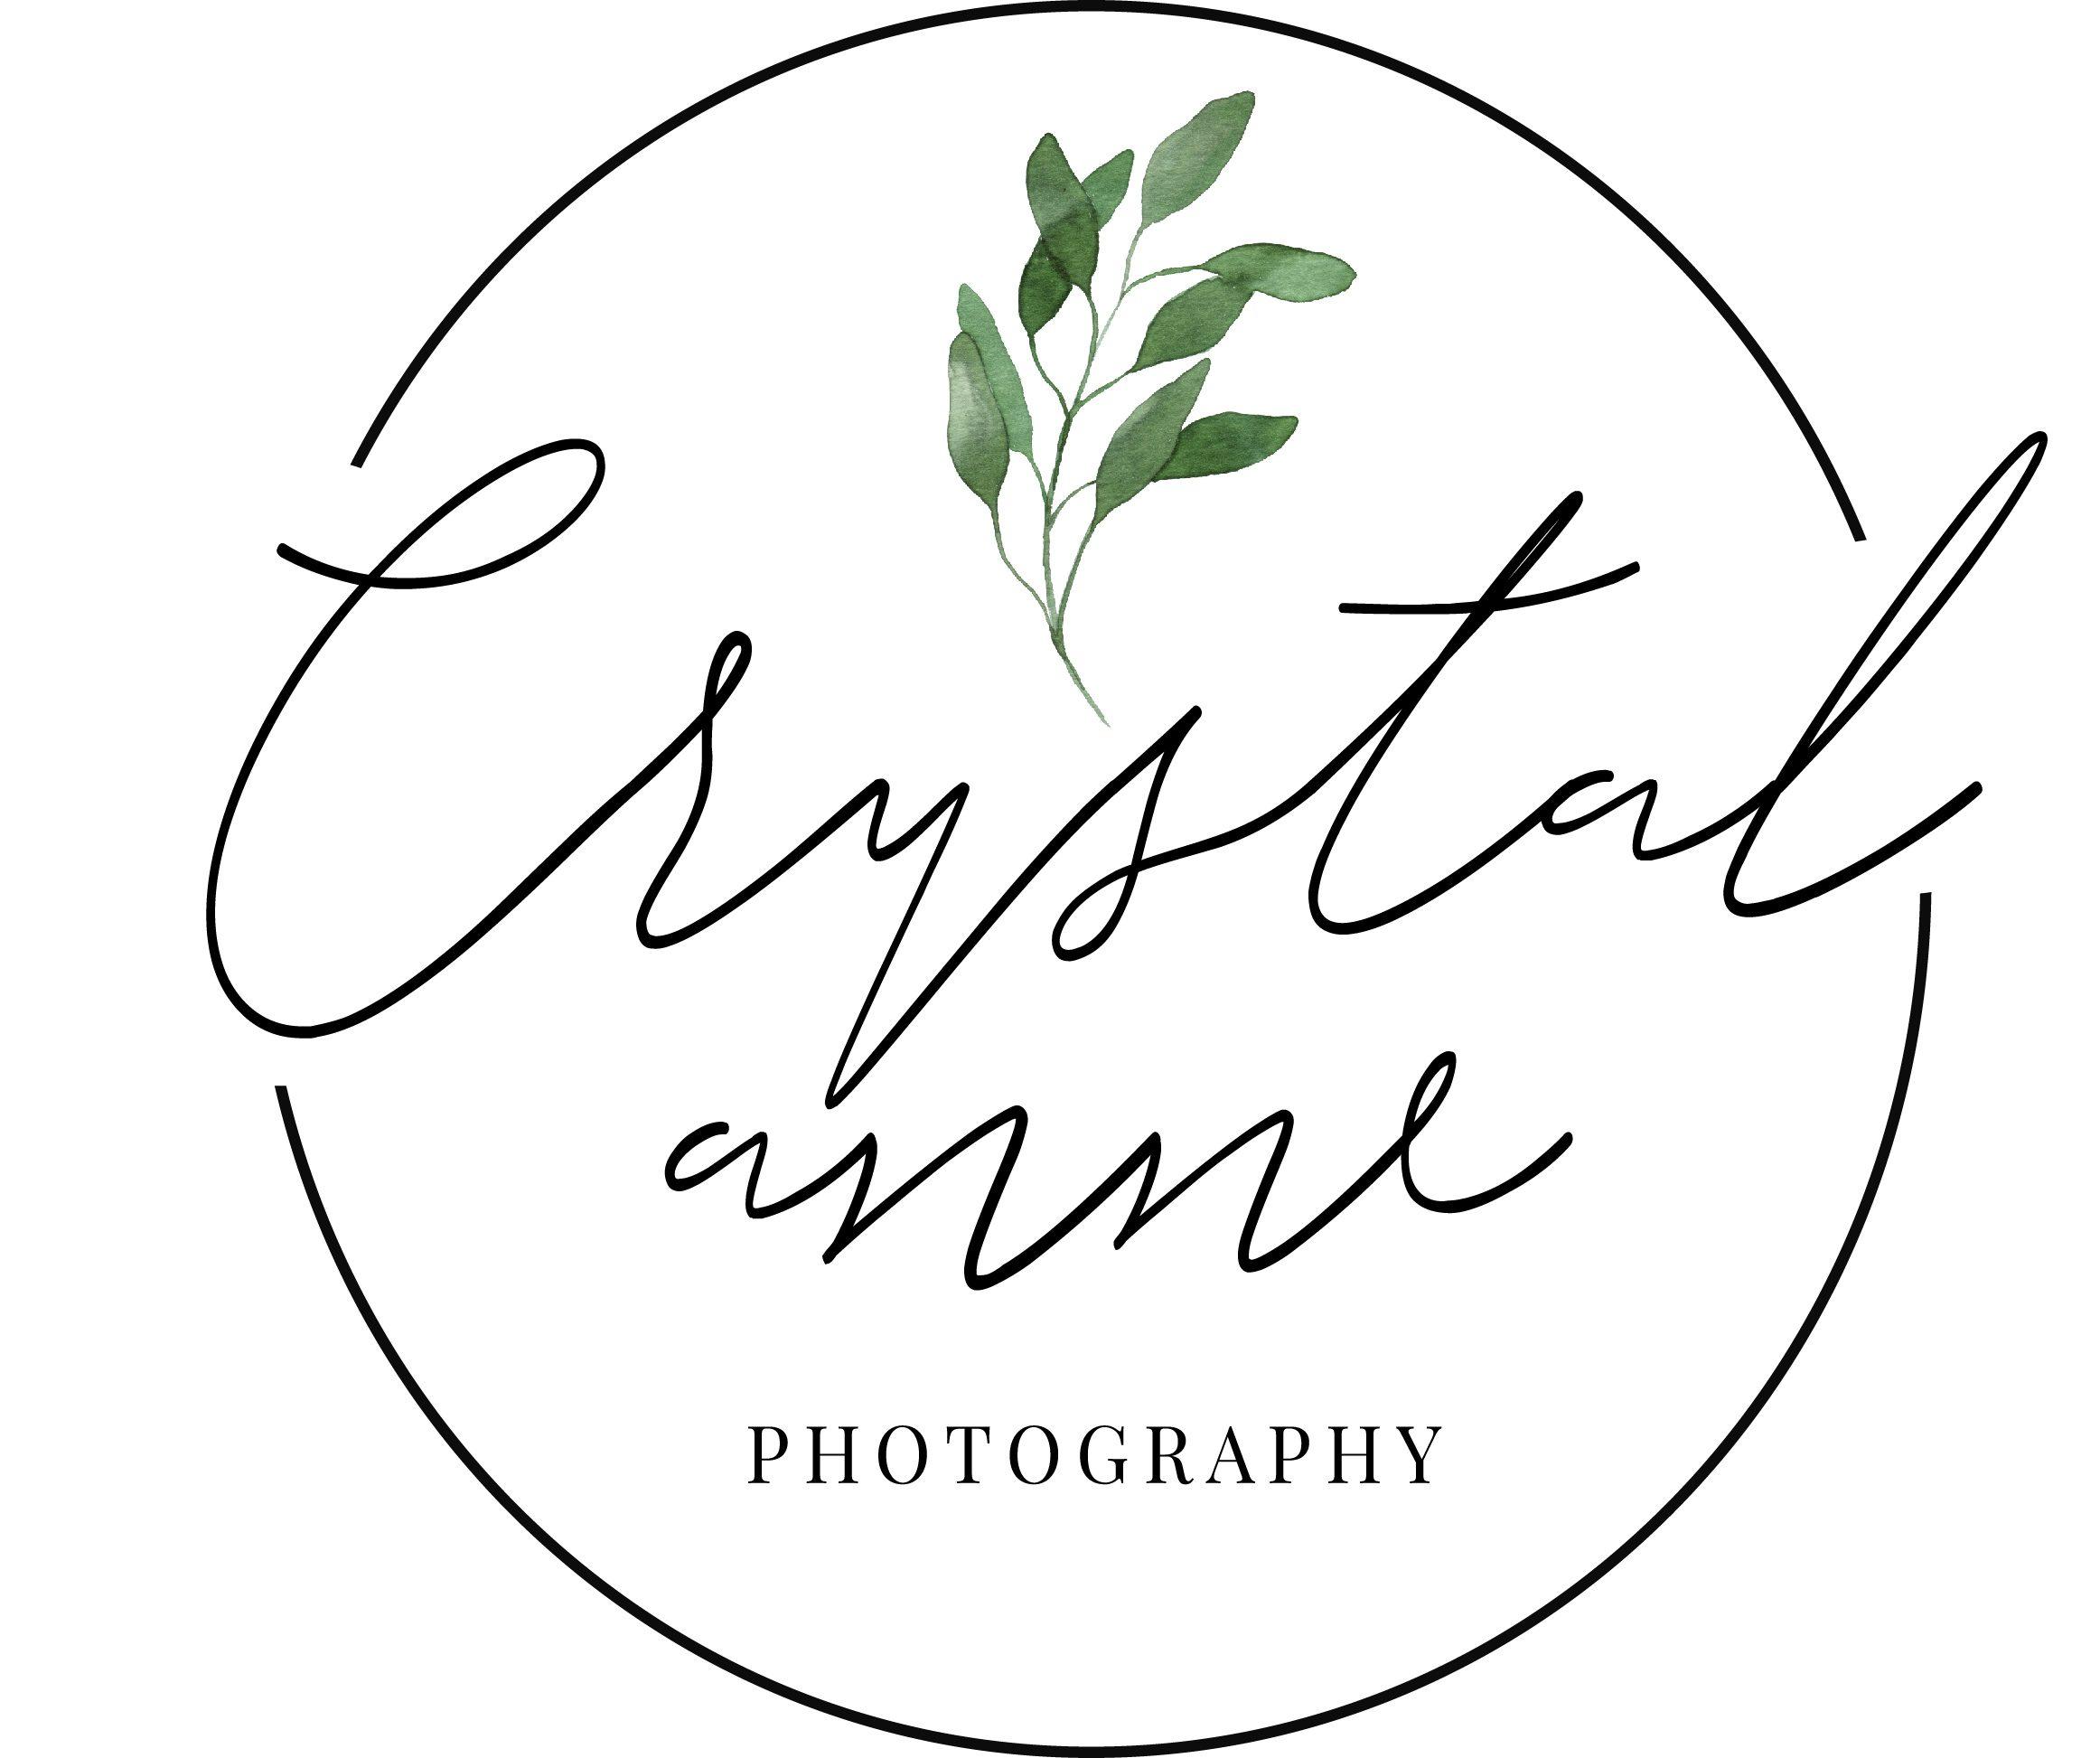 Crystal Anne Photo